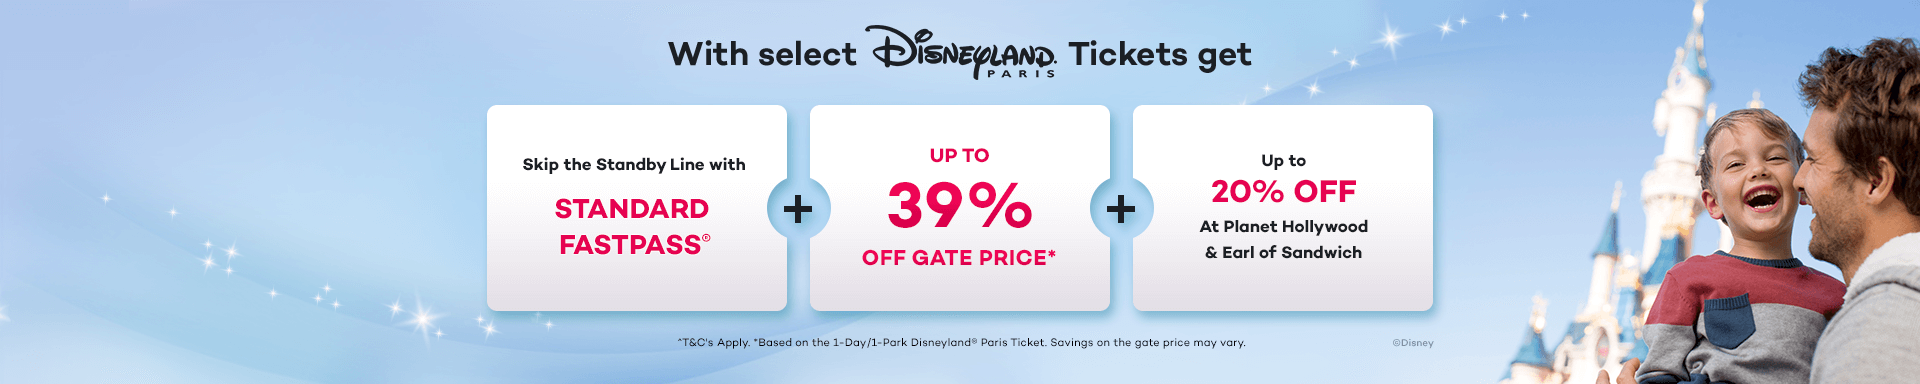 Save up to 39% on Disneyland Paris Tickets